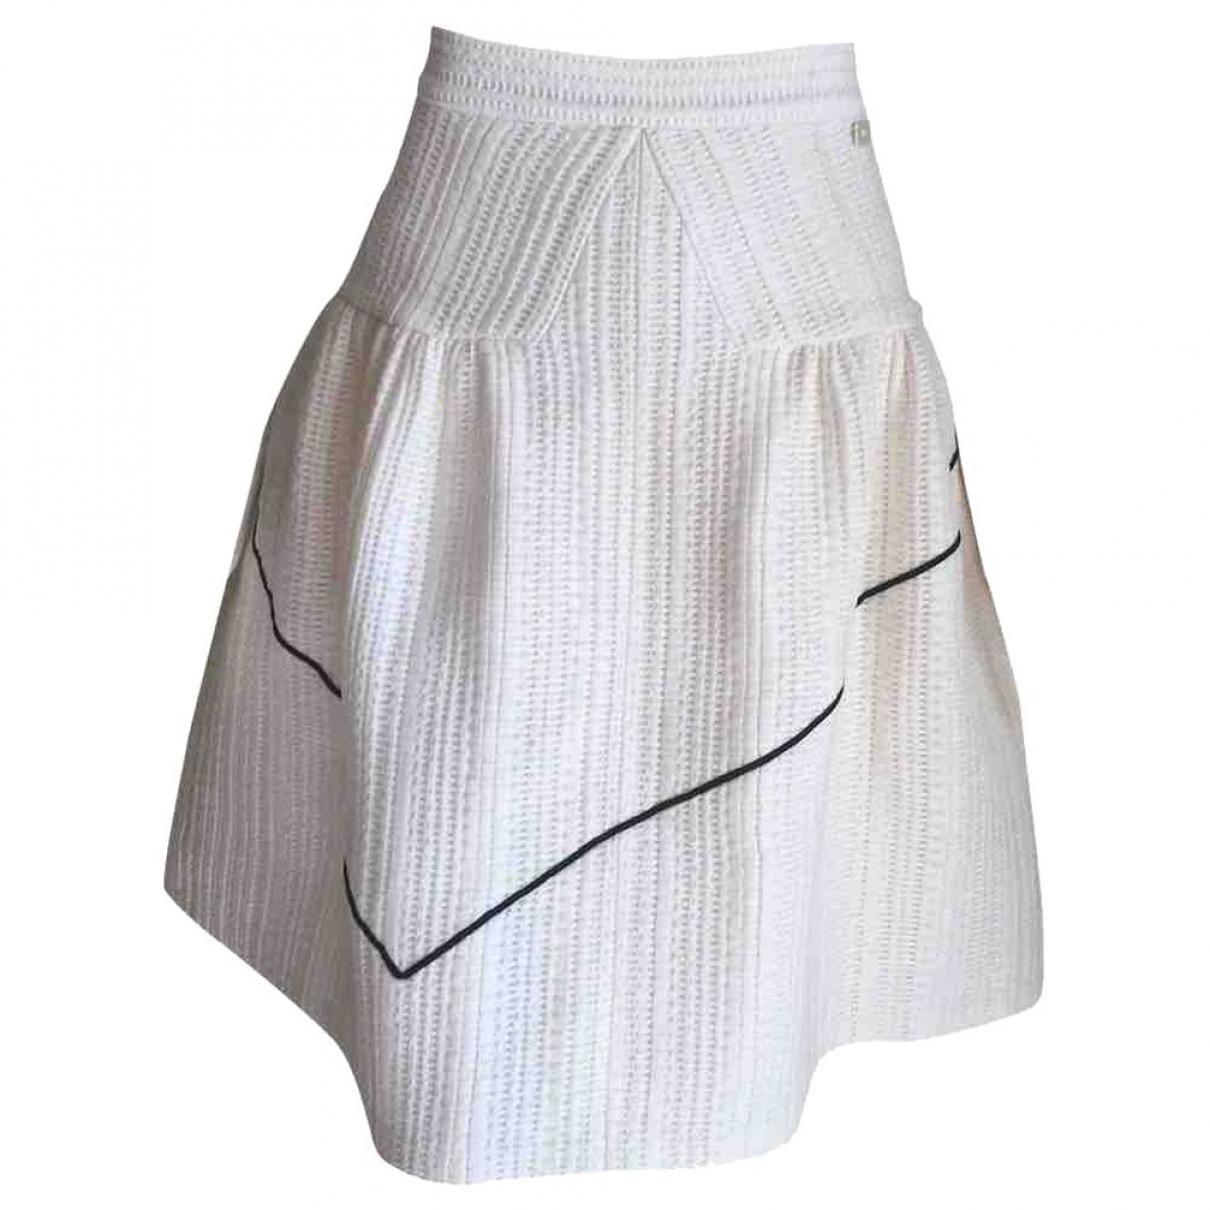 Chanel \N Ecru Silk skirt for Women 38 FR